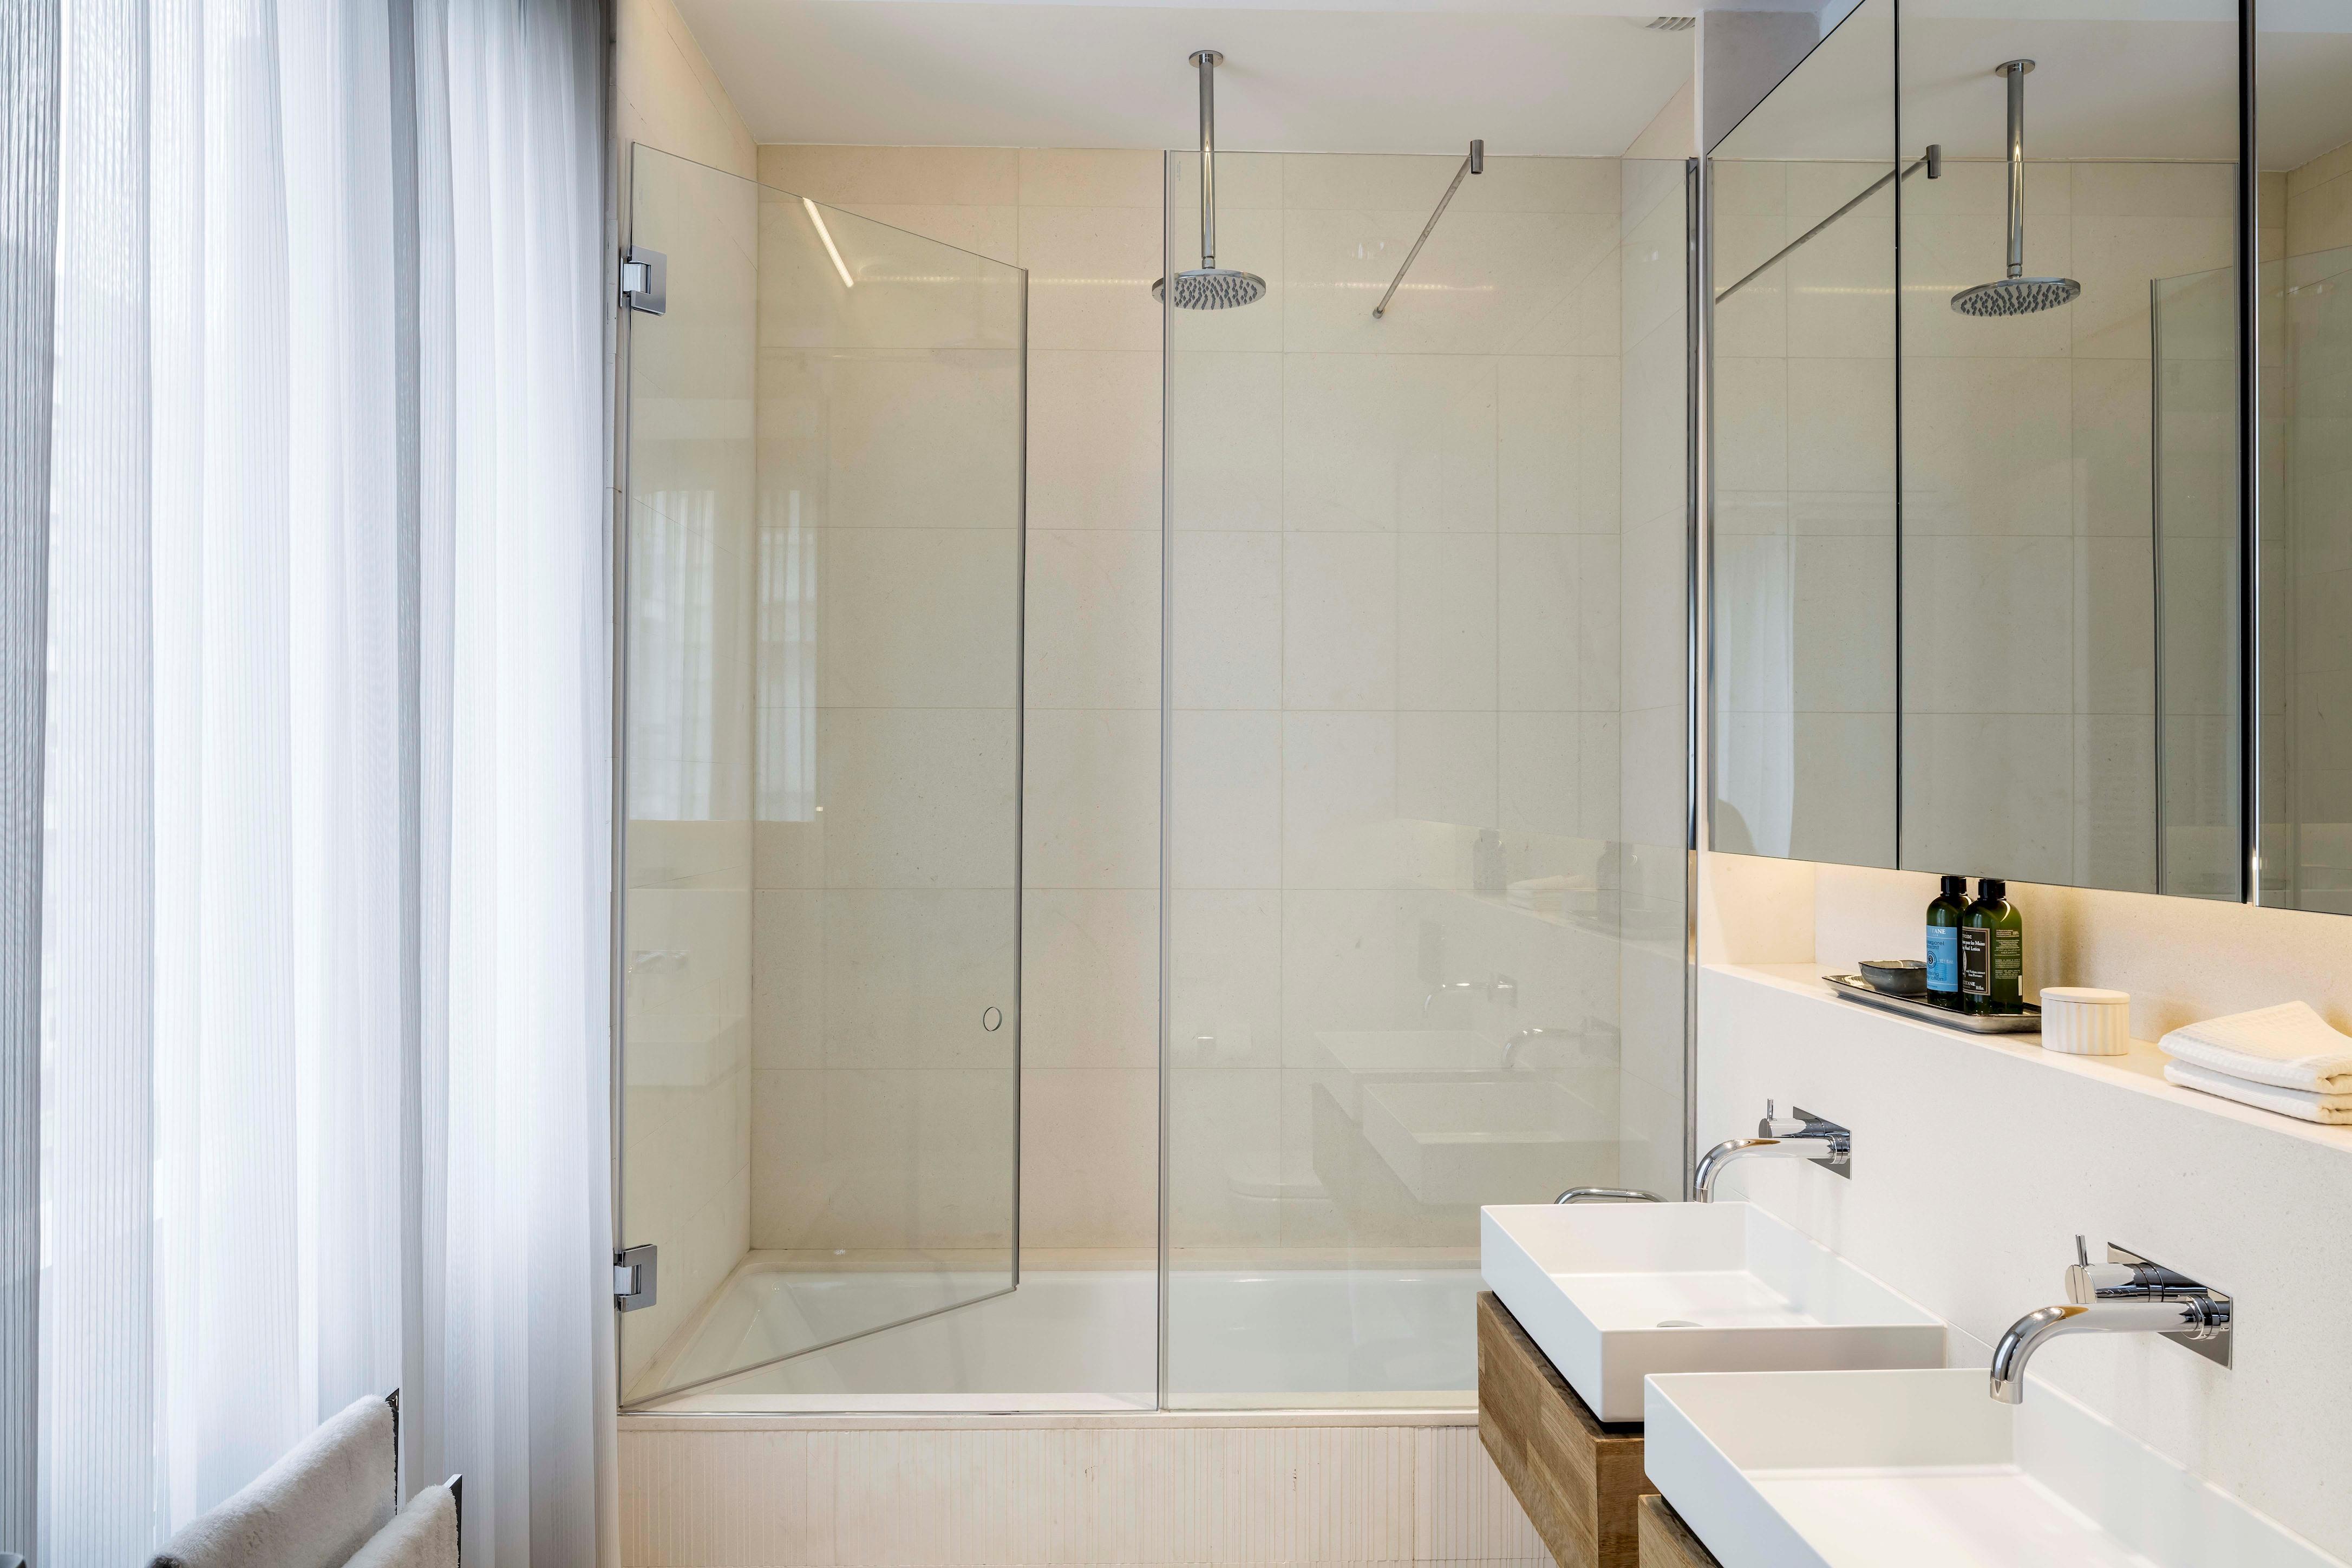 Apartment Luxury Apartment 2 bedrooms Loft 1 photo 23407509